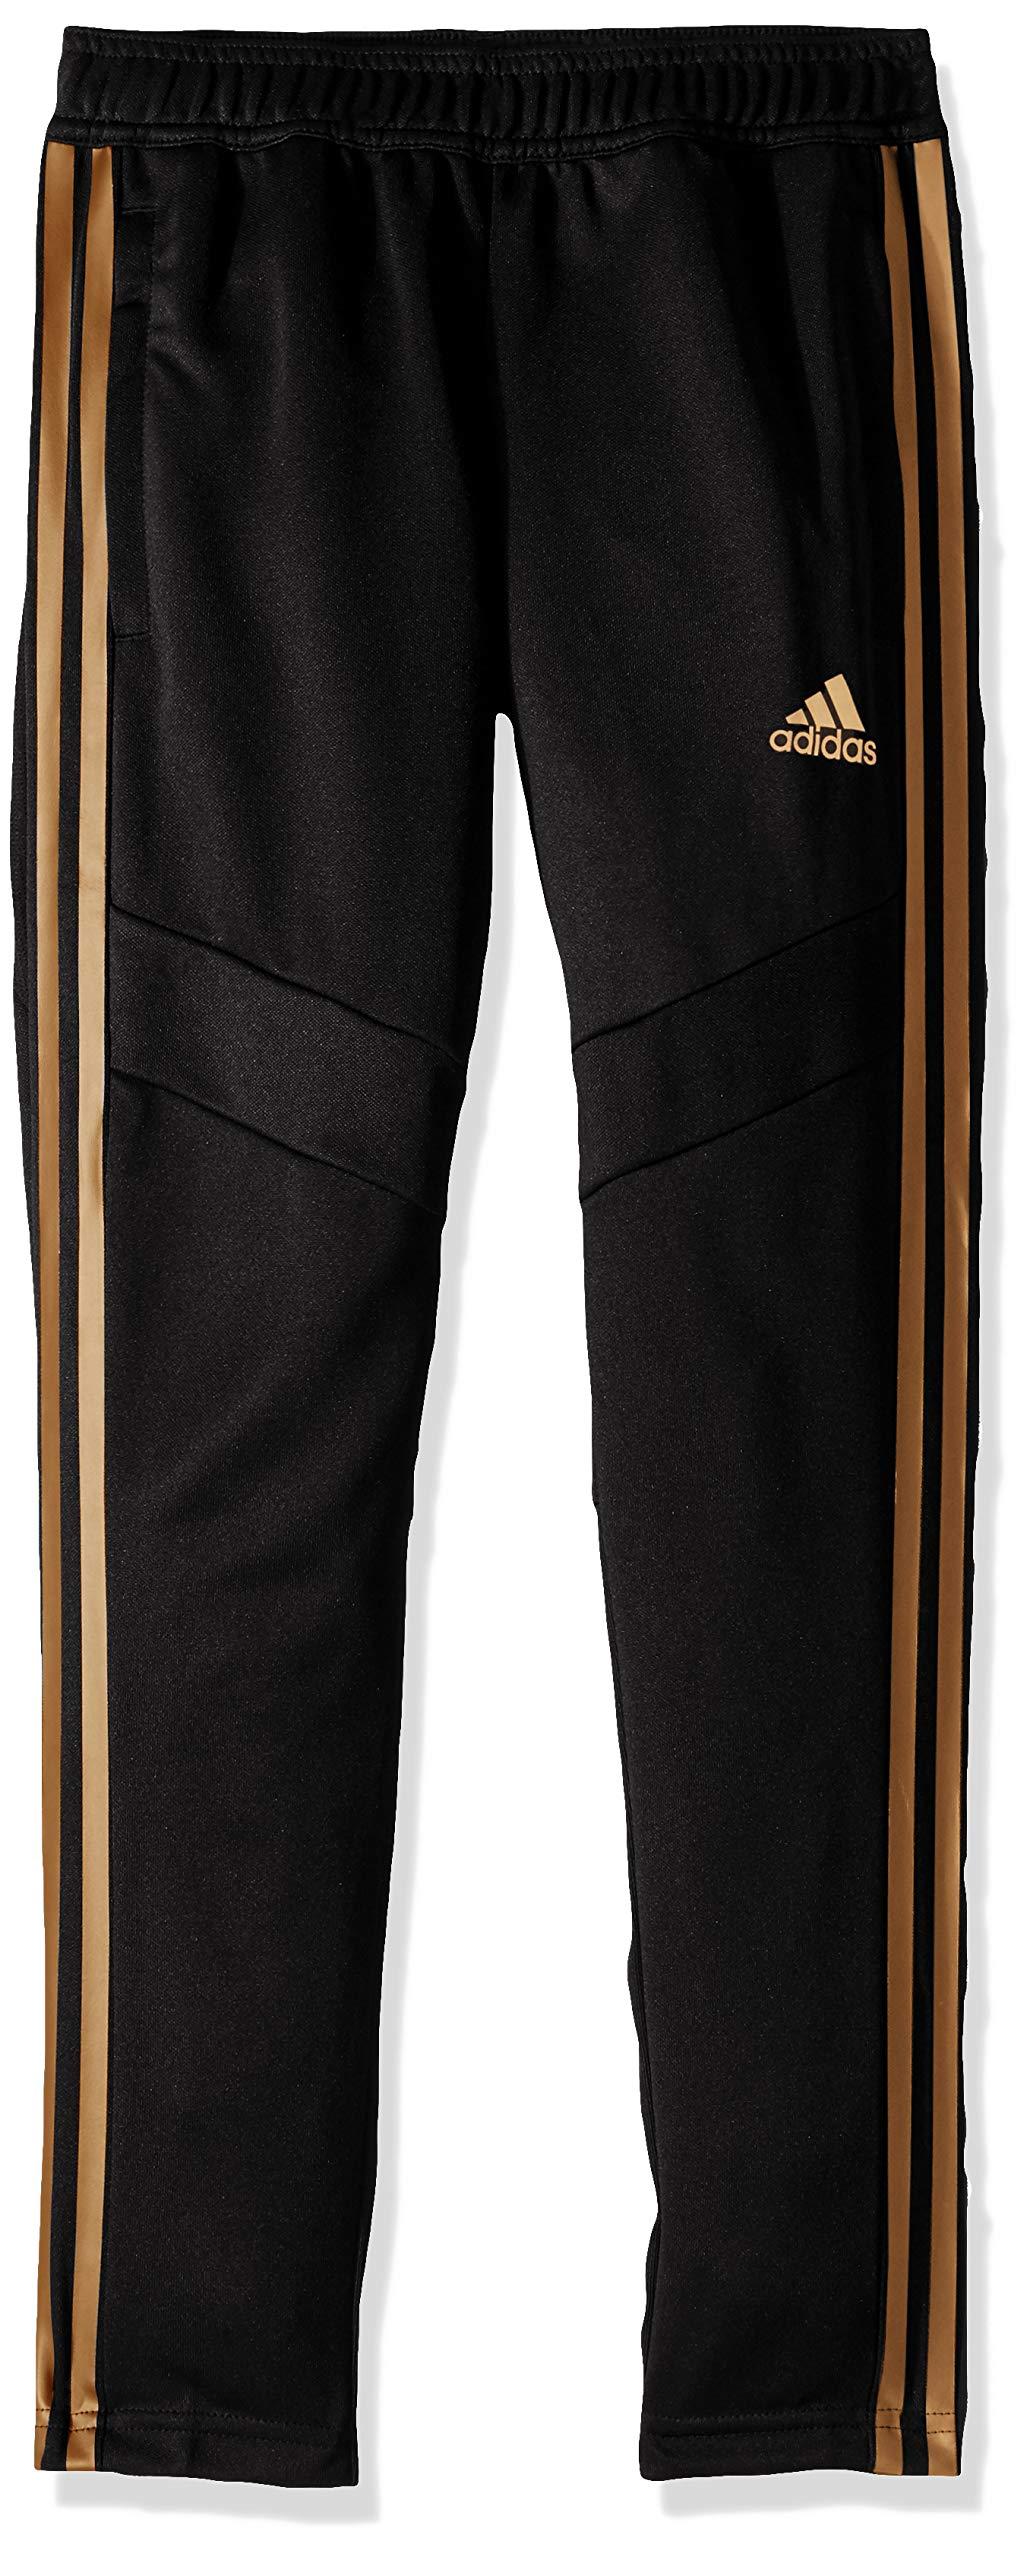 adidas Originals Boys' Big Tiro 19 Pant, Black/Nude Pearl Essence, Medium